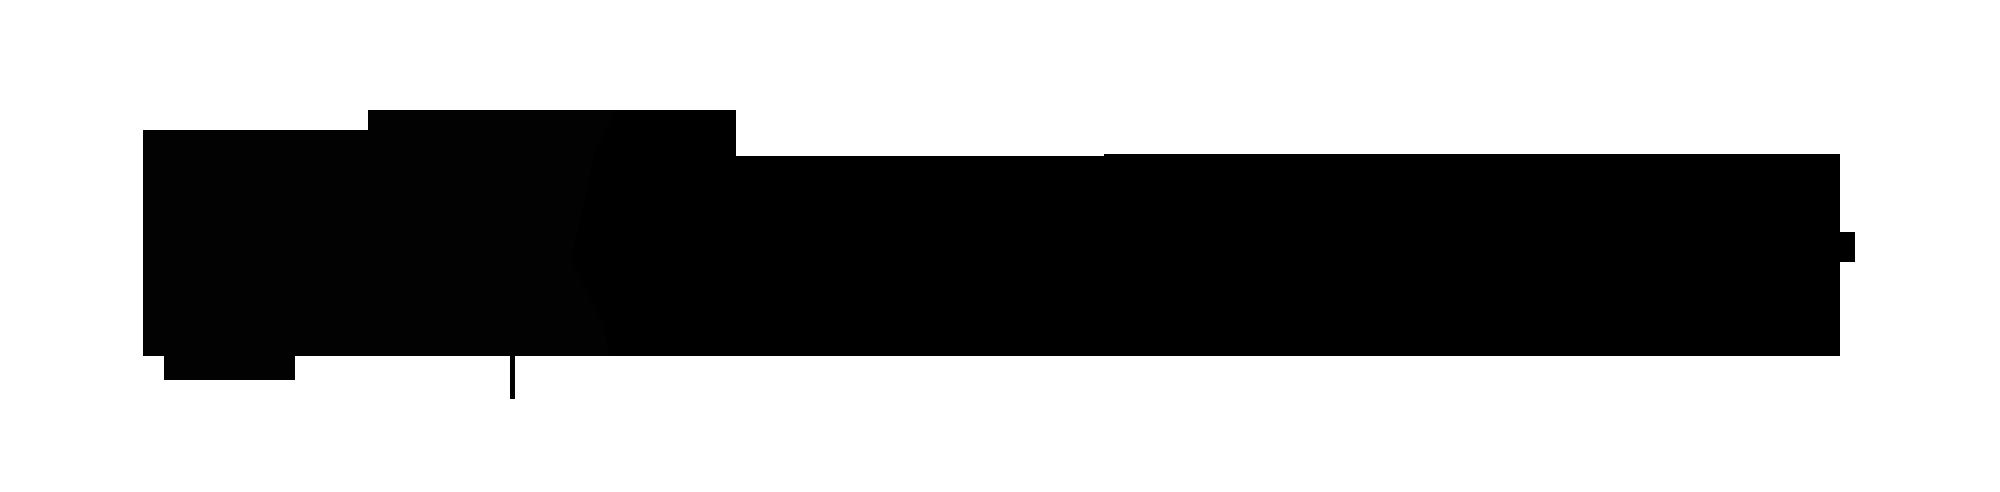 ASCQPHARMA